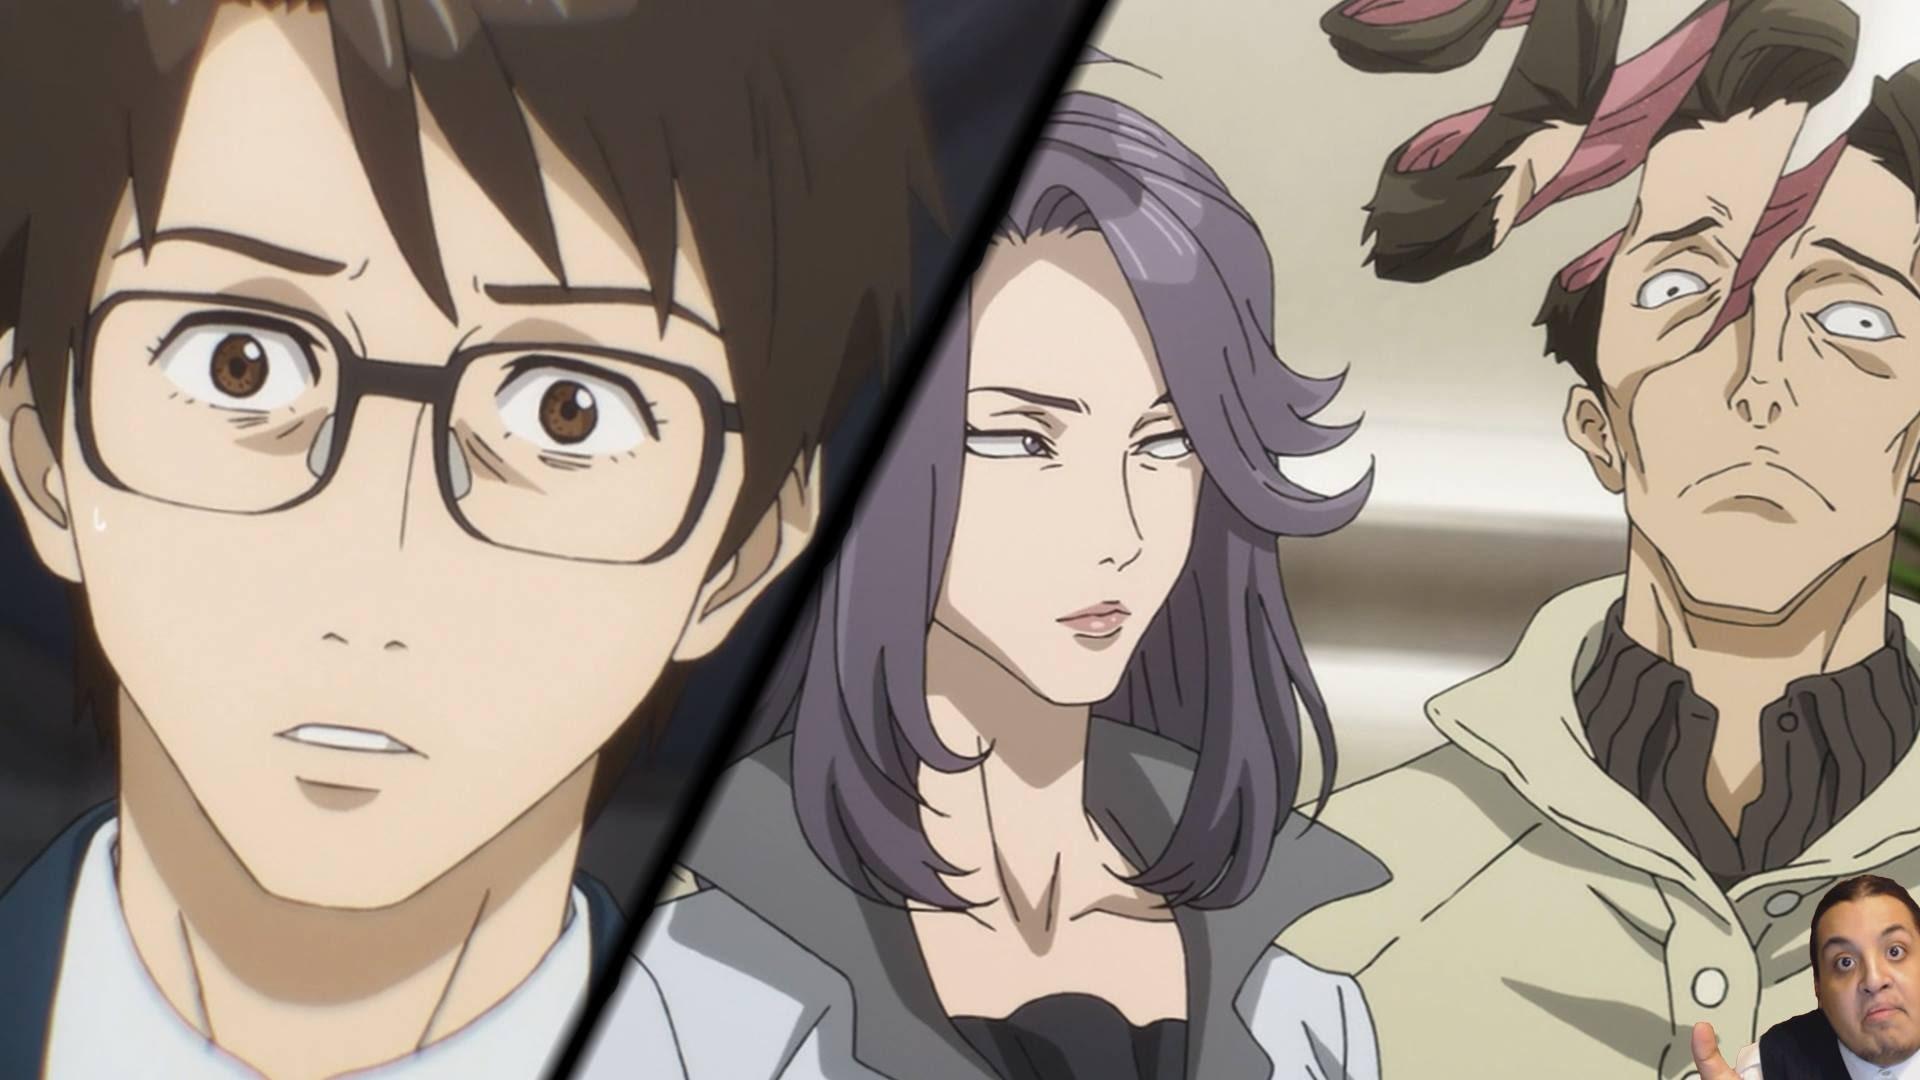 Parasyte The Maxim Episode 3 寄生獣 セイの格率 – KiseijÅ« – Anime Review — Shinichi  Vs Tamiya's A – YouTube